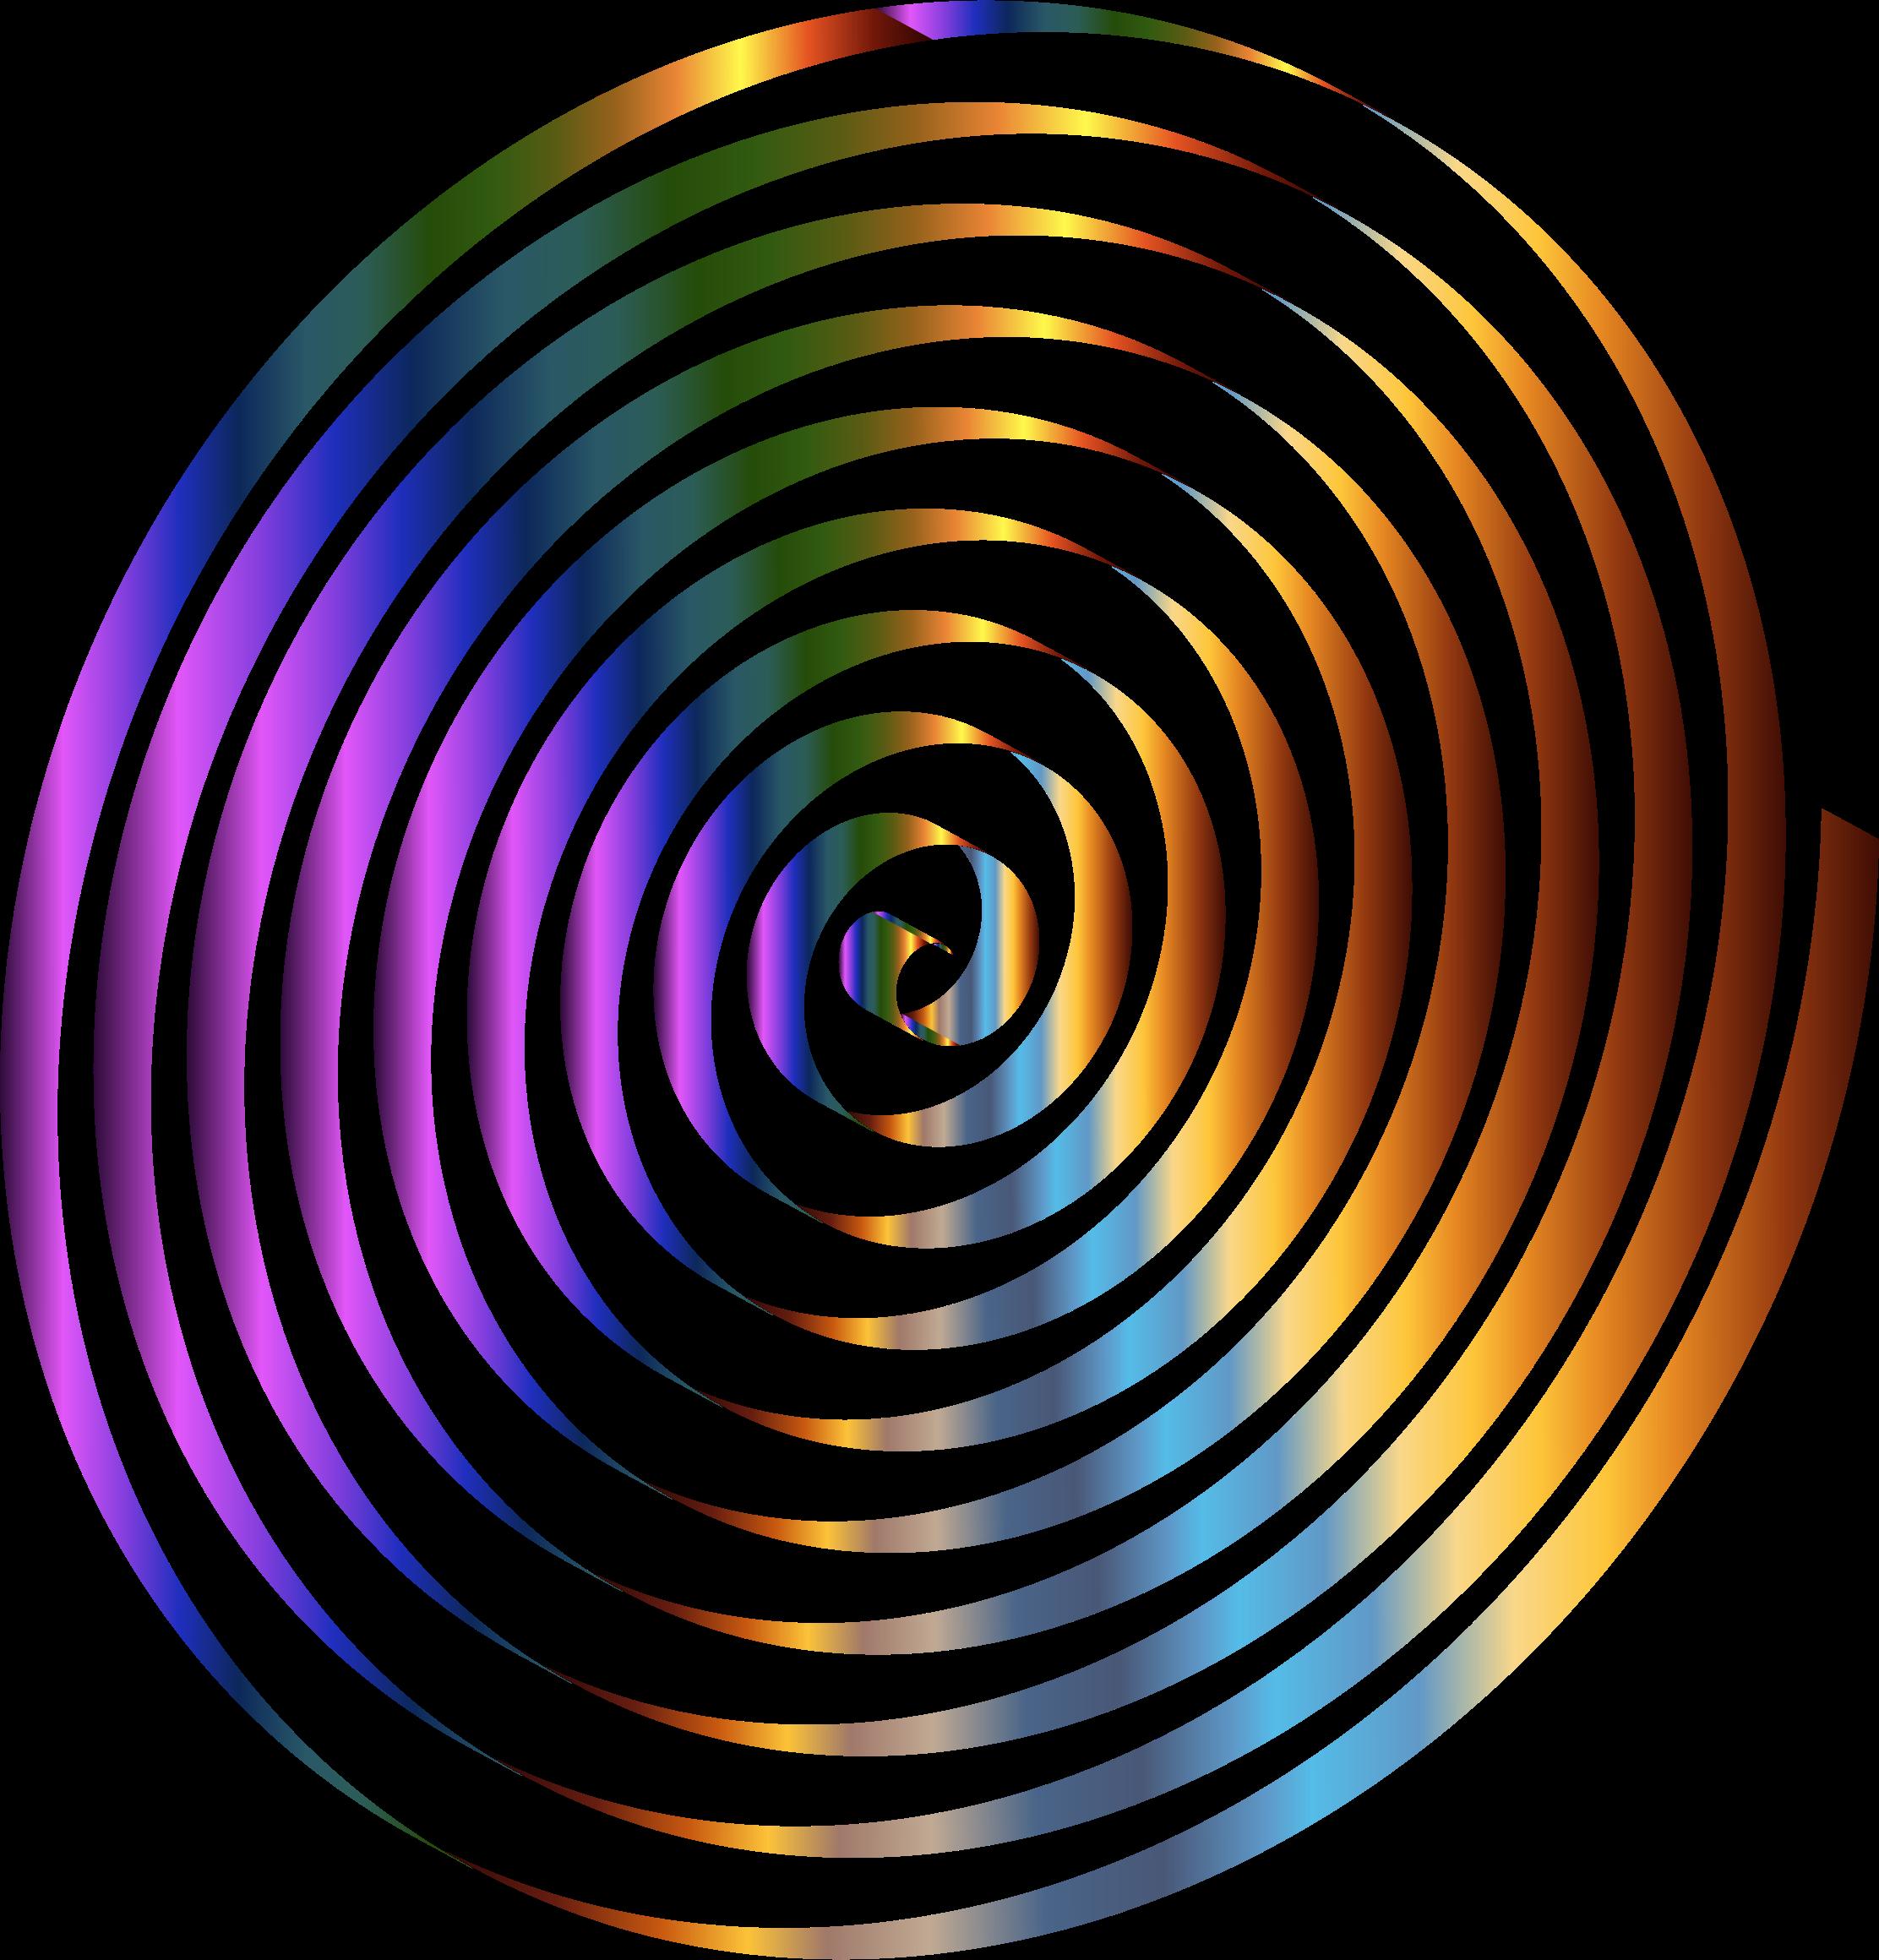 Chromatic 3d Spiral on Circle Clip Art